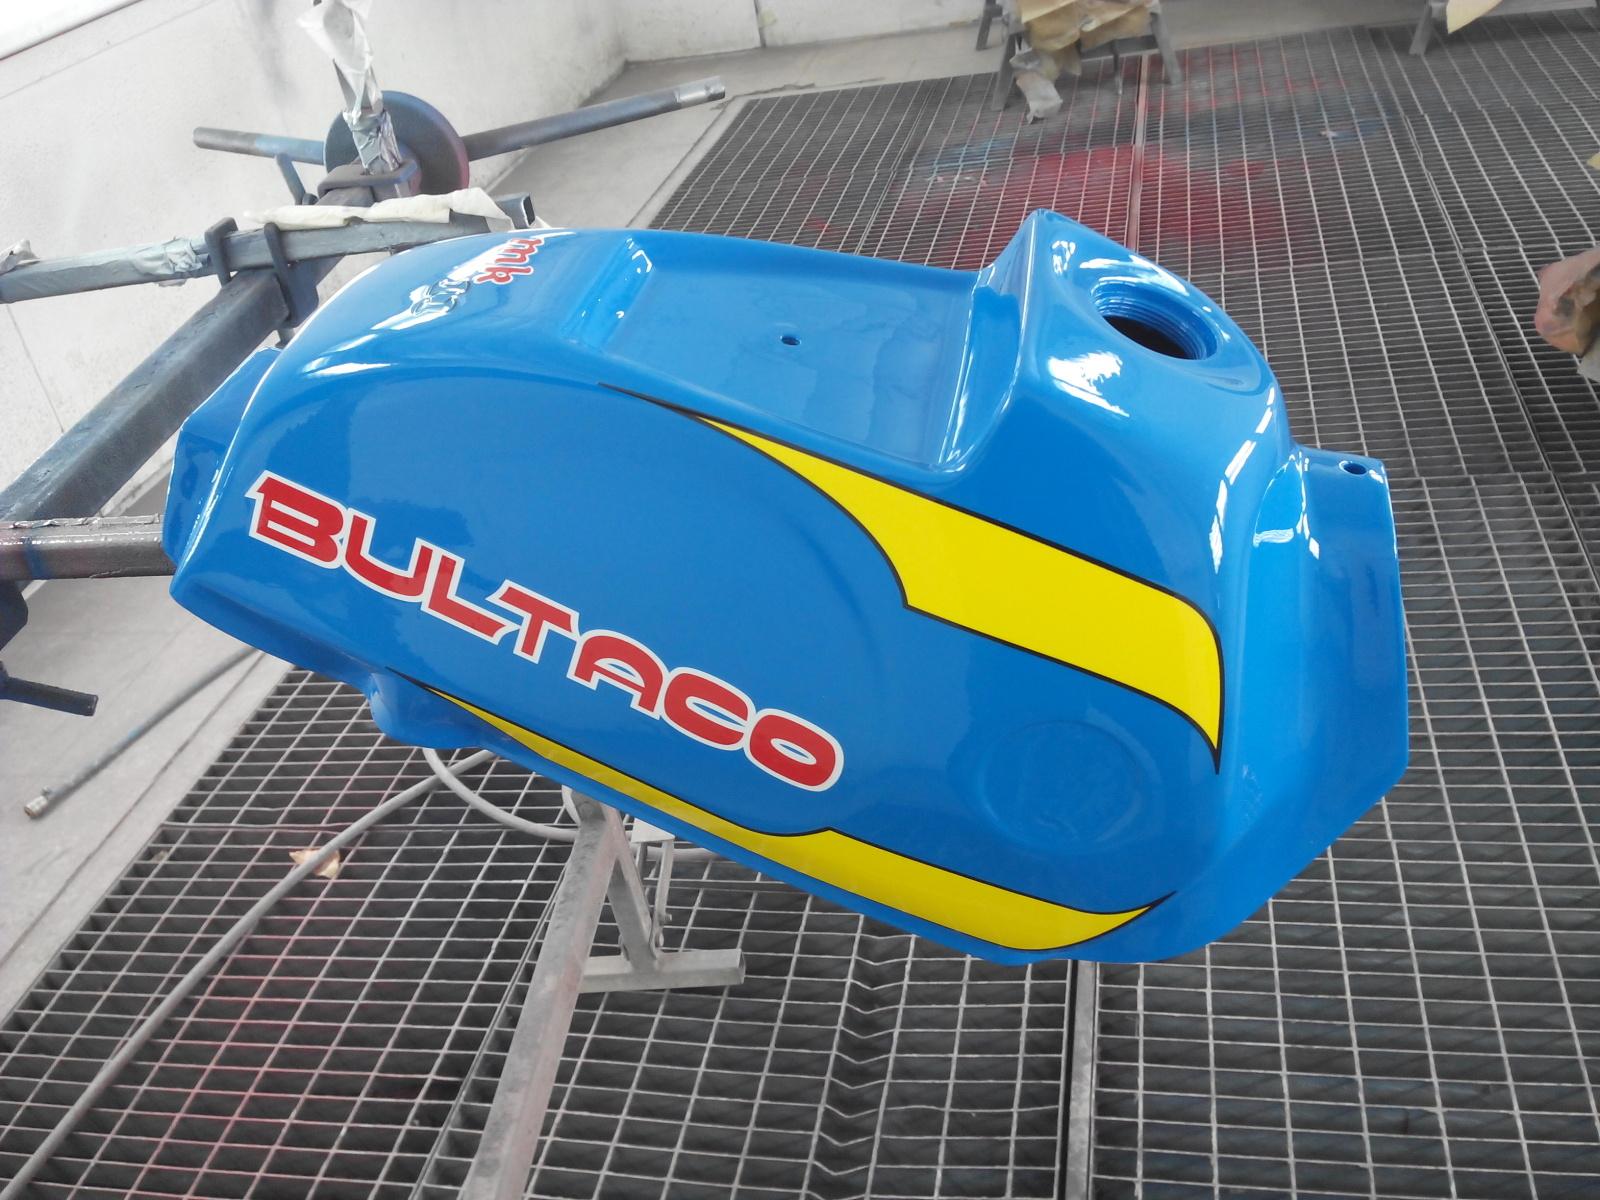 Bultaco MK11 370 - Motor - Página 2 2118c93